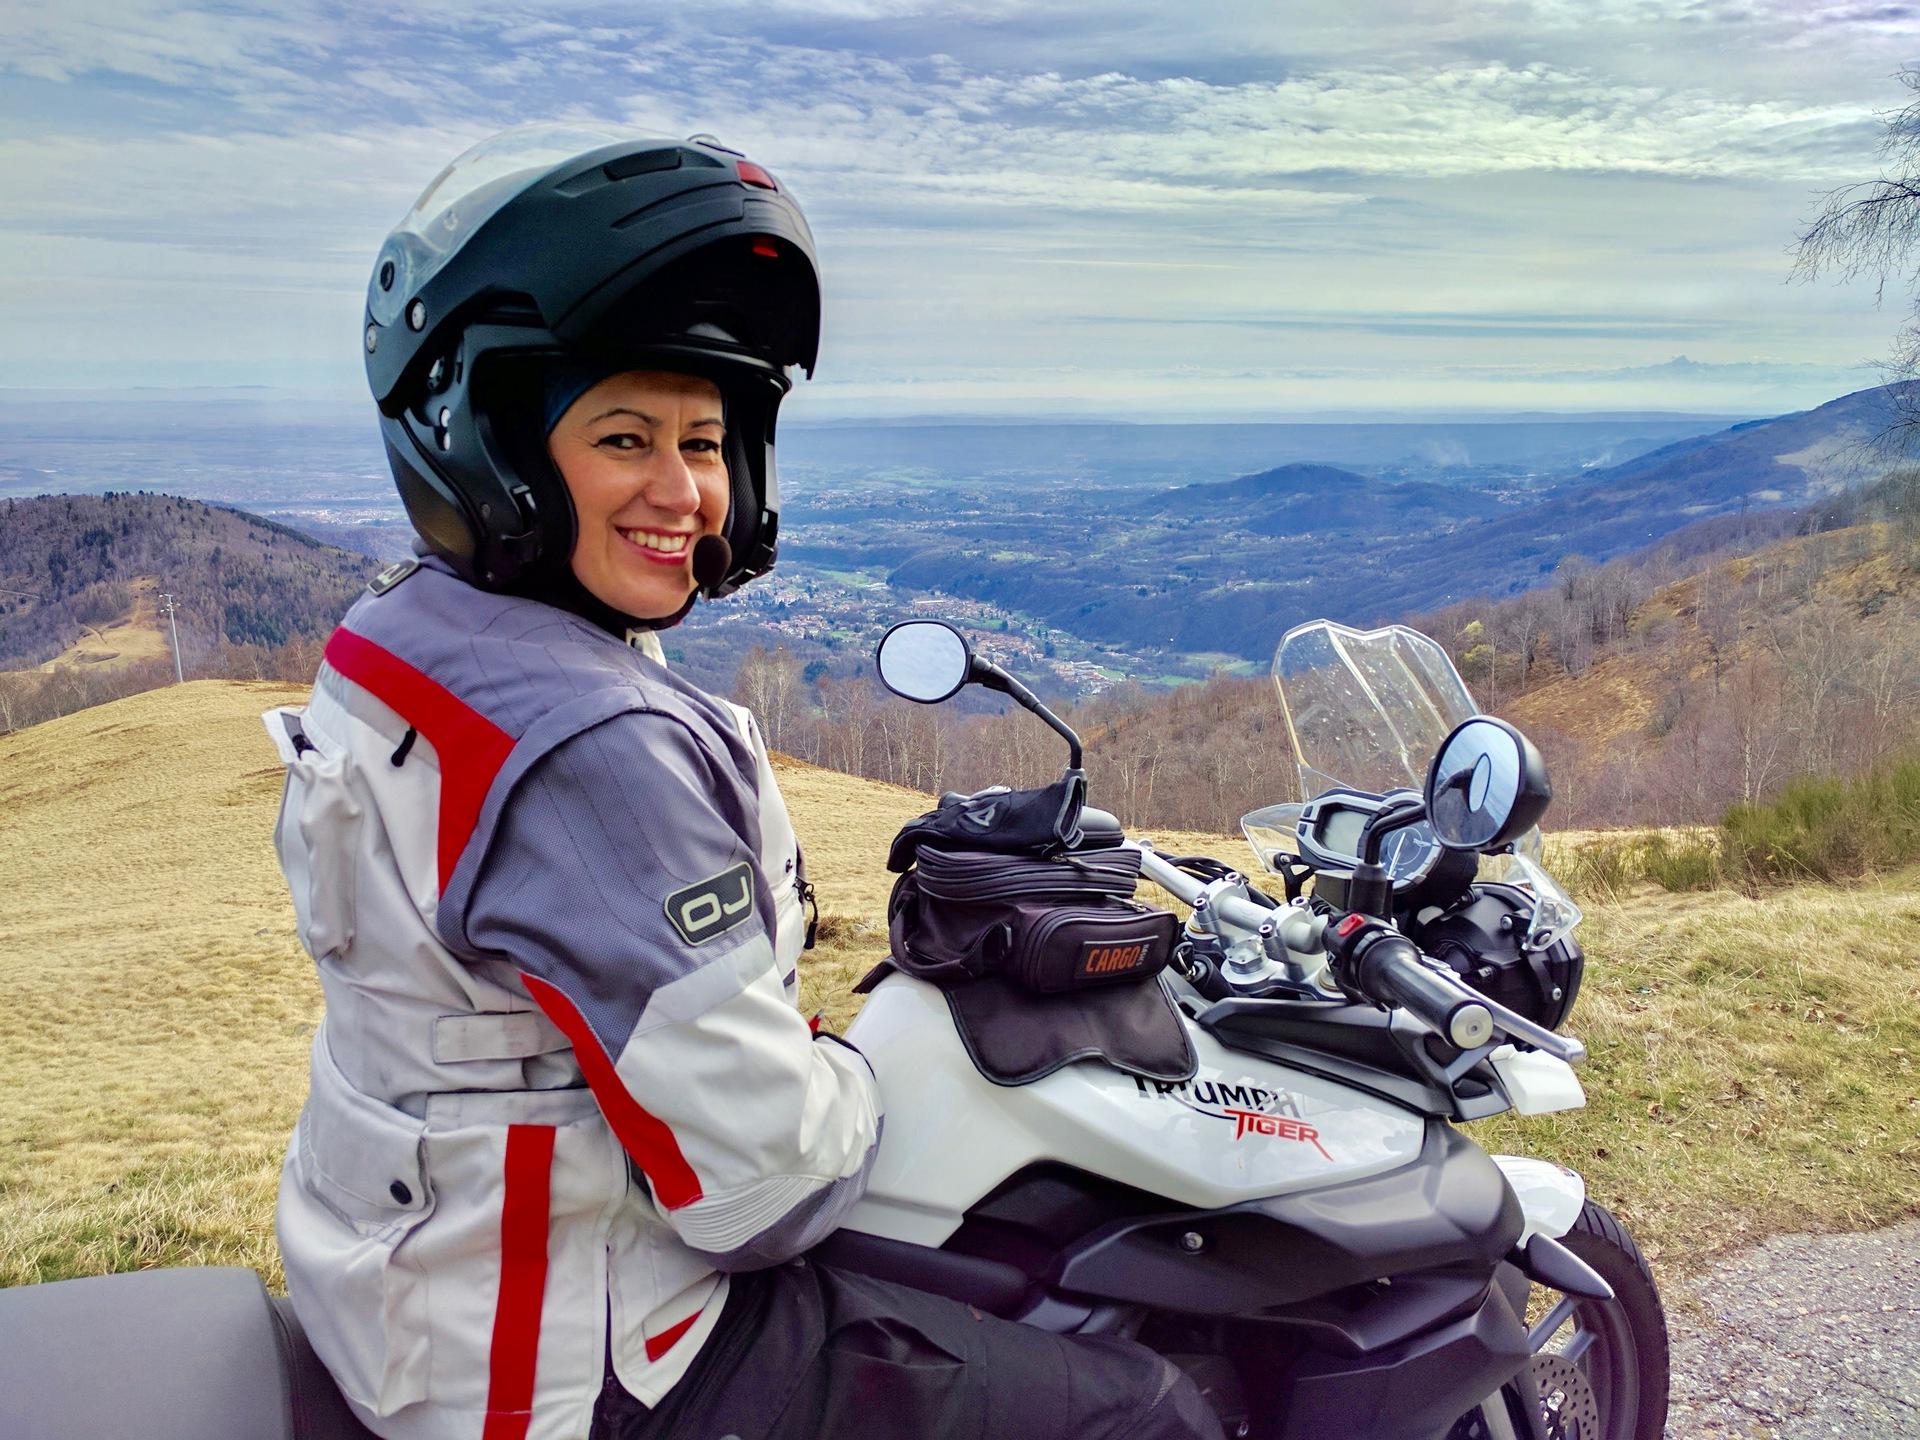 3 Day Fun, Food and Wellness Special Girls Weekend Motorbike Tour | Giroola